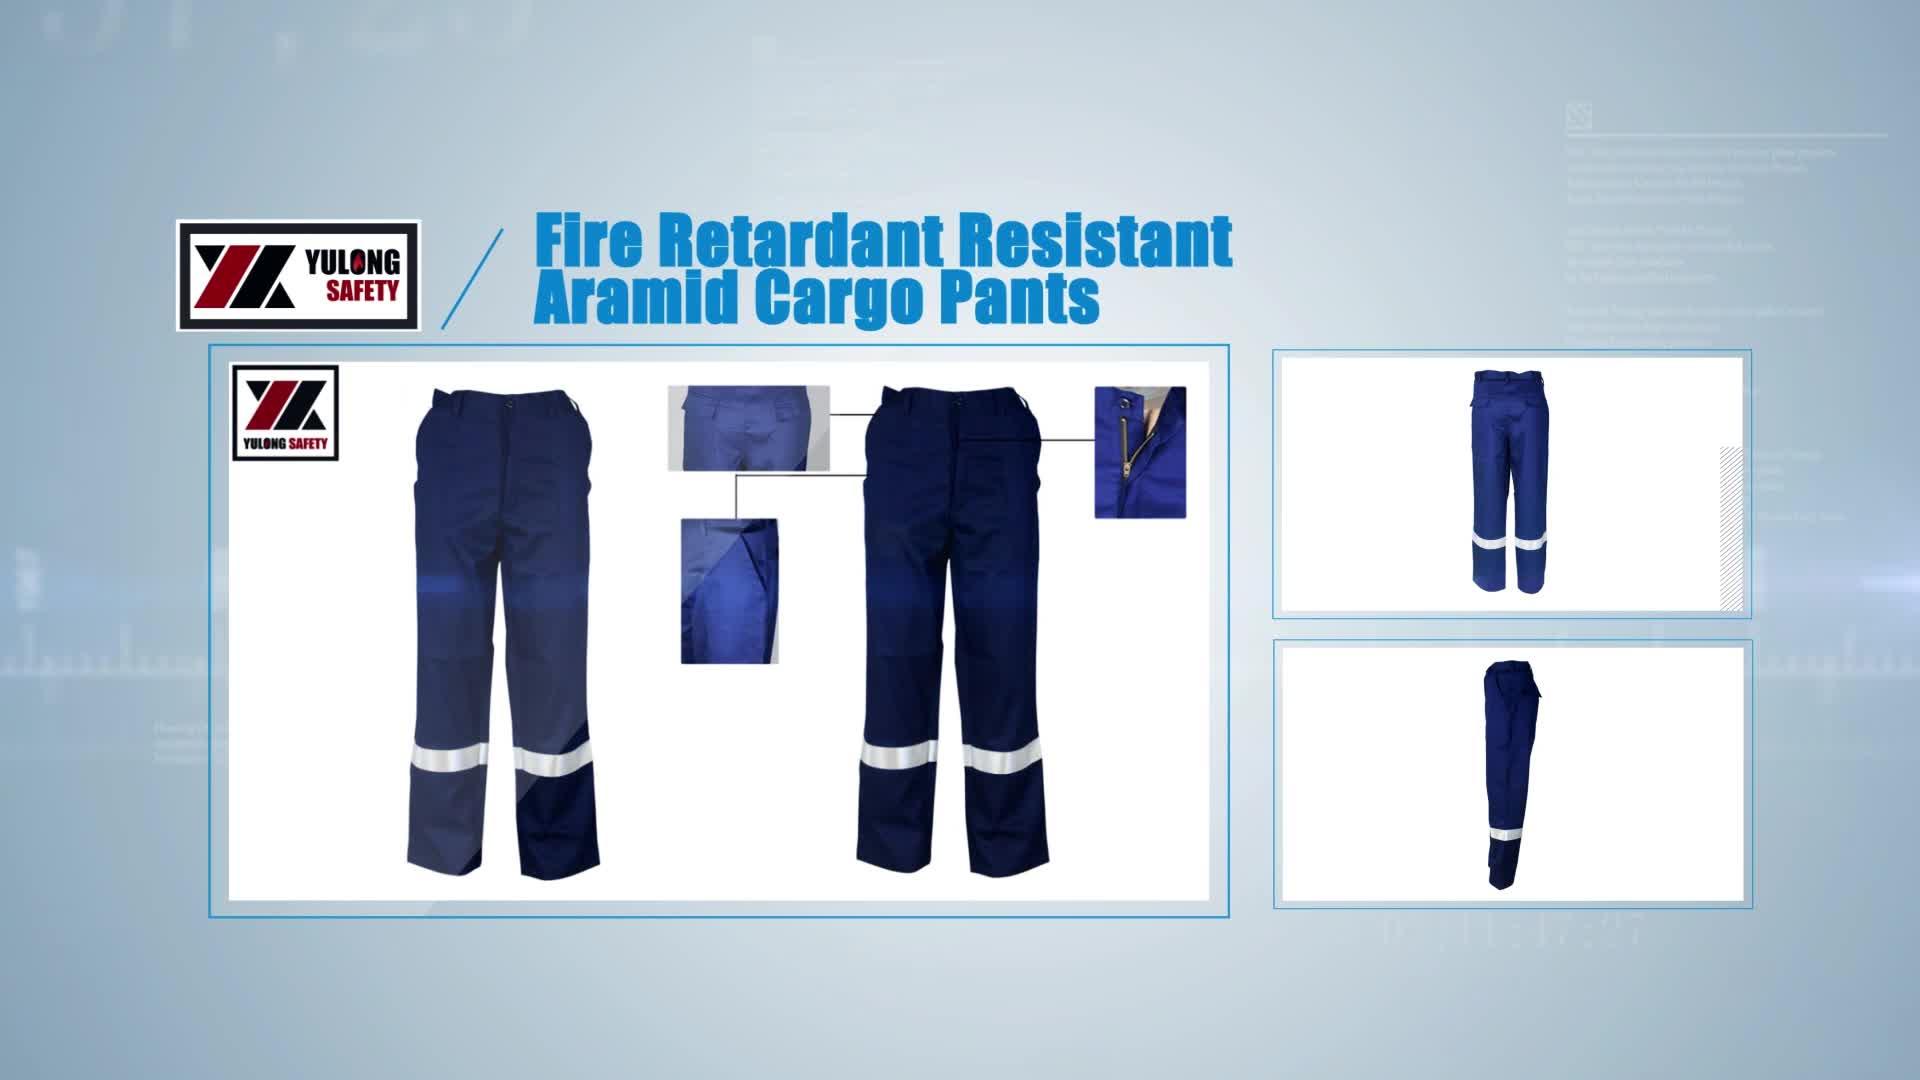 Yulong Produced 100% Cotton Lightweight Flame Retardant Pants